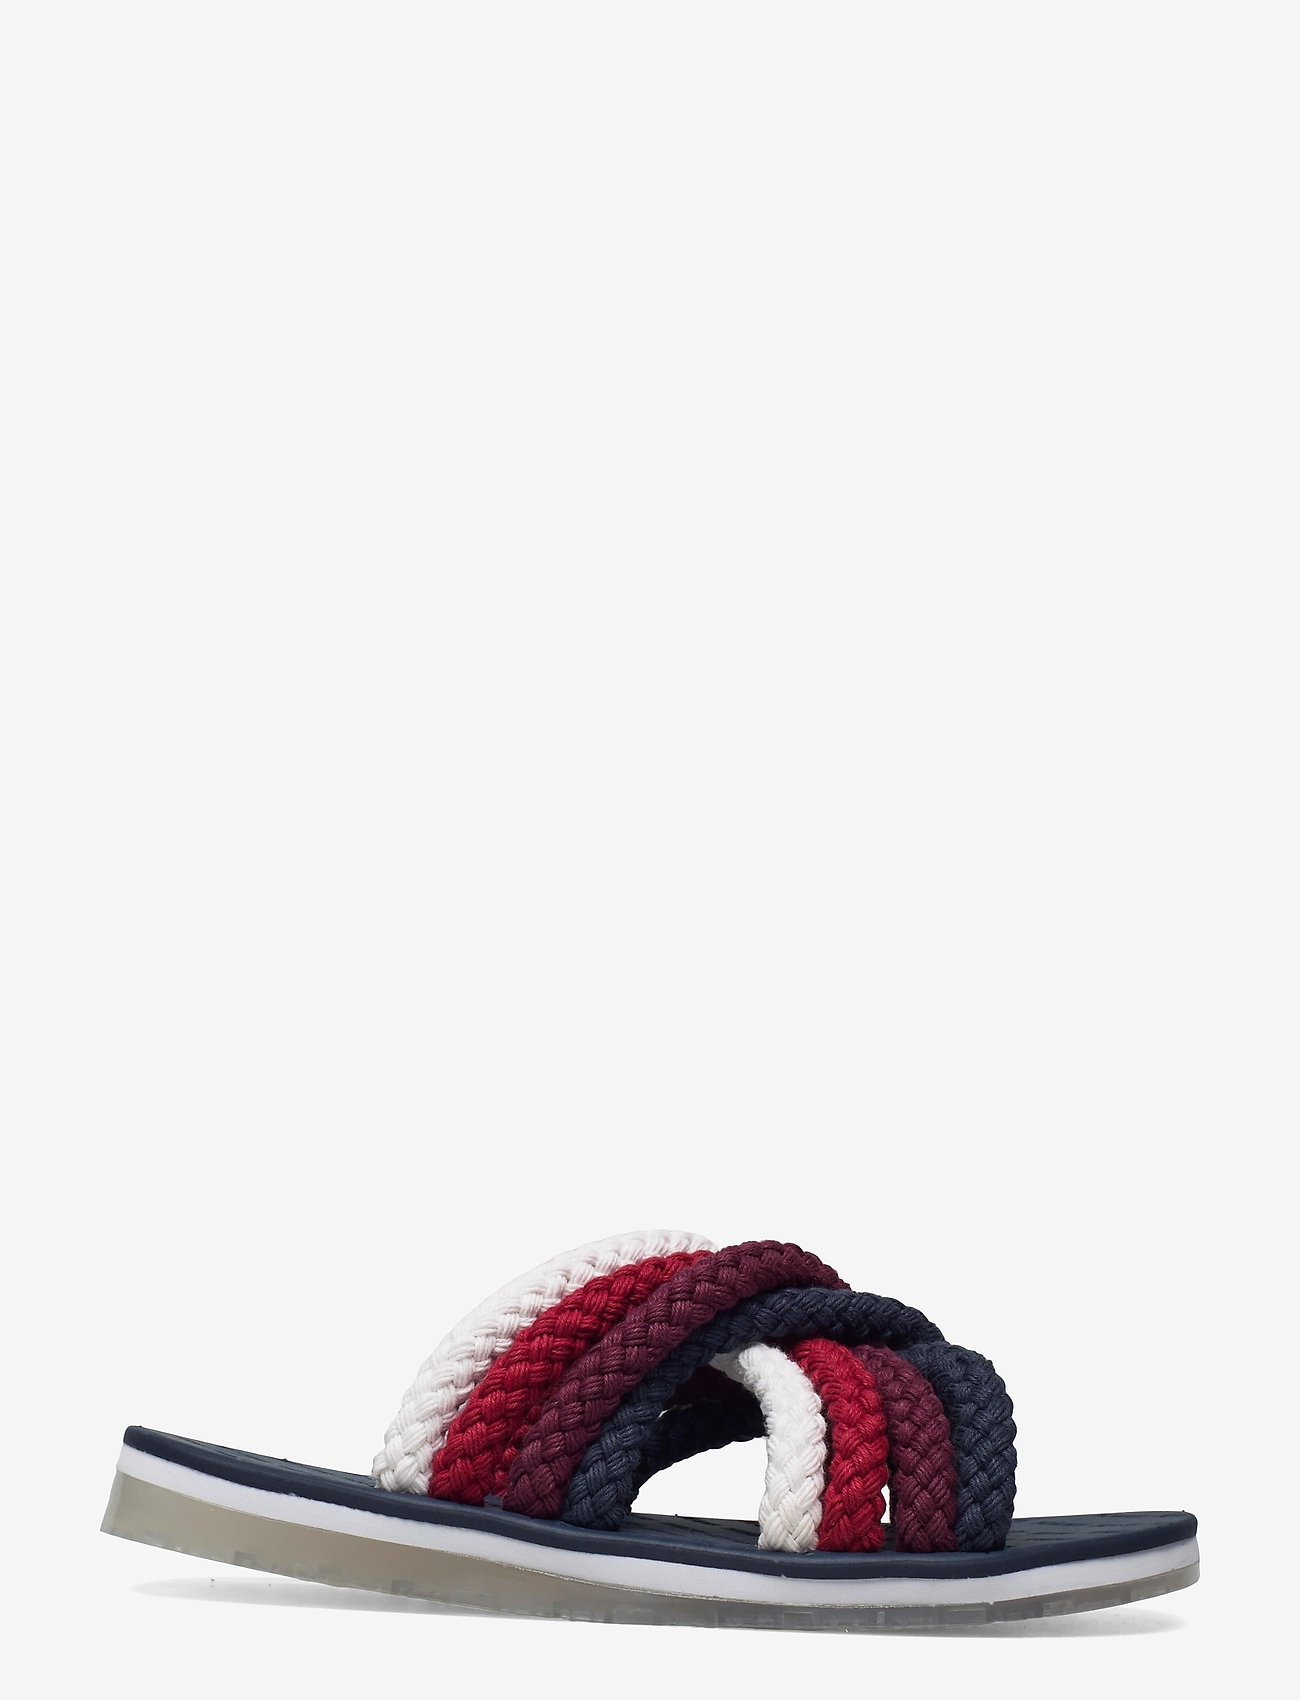 Tommy Hilfiger - CROSS STRAP MULE SANDAL - flat sandals - twilight navy - 1